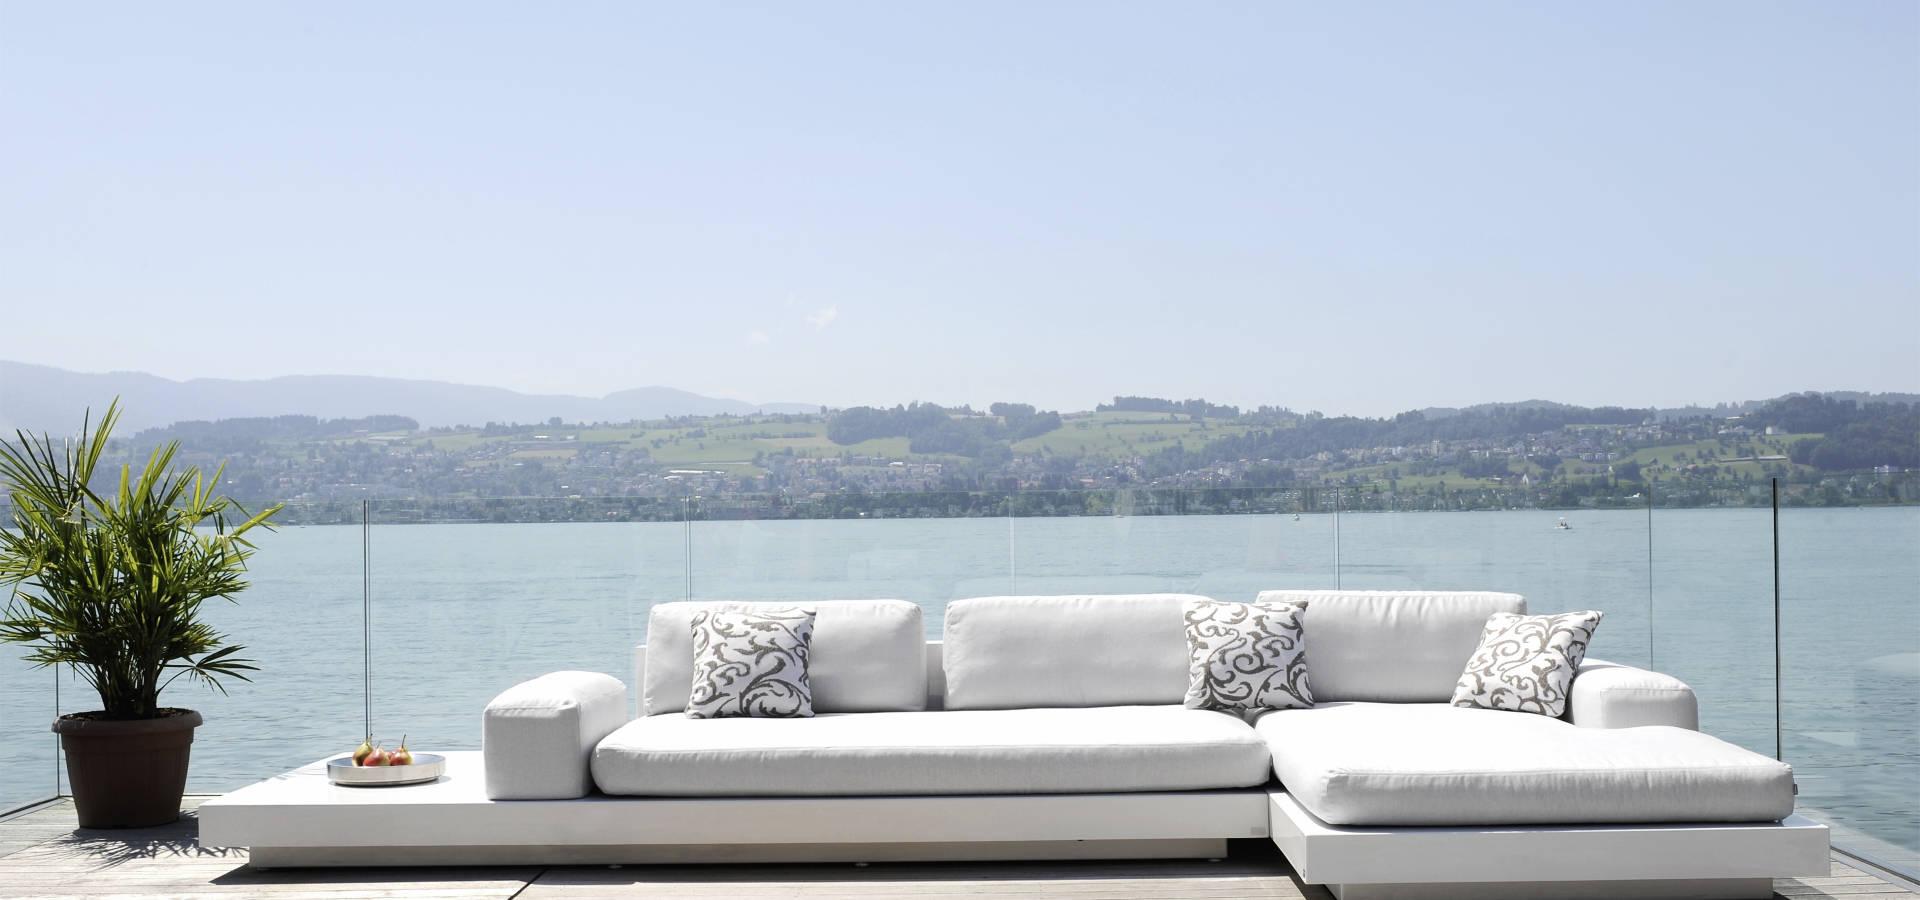 Rausch sofá terraza exterior